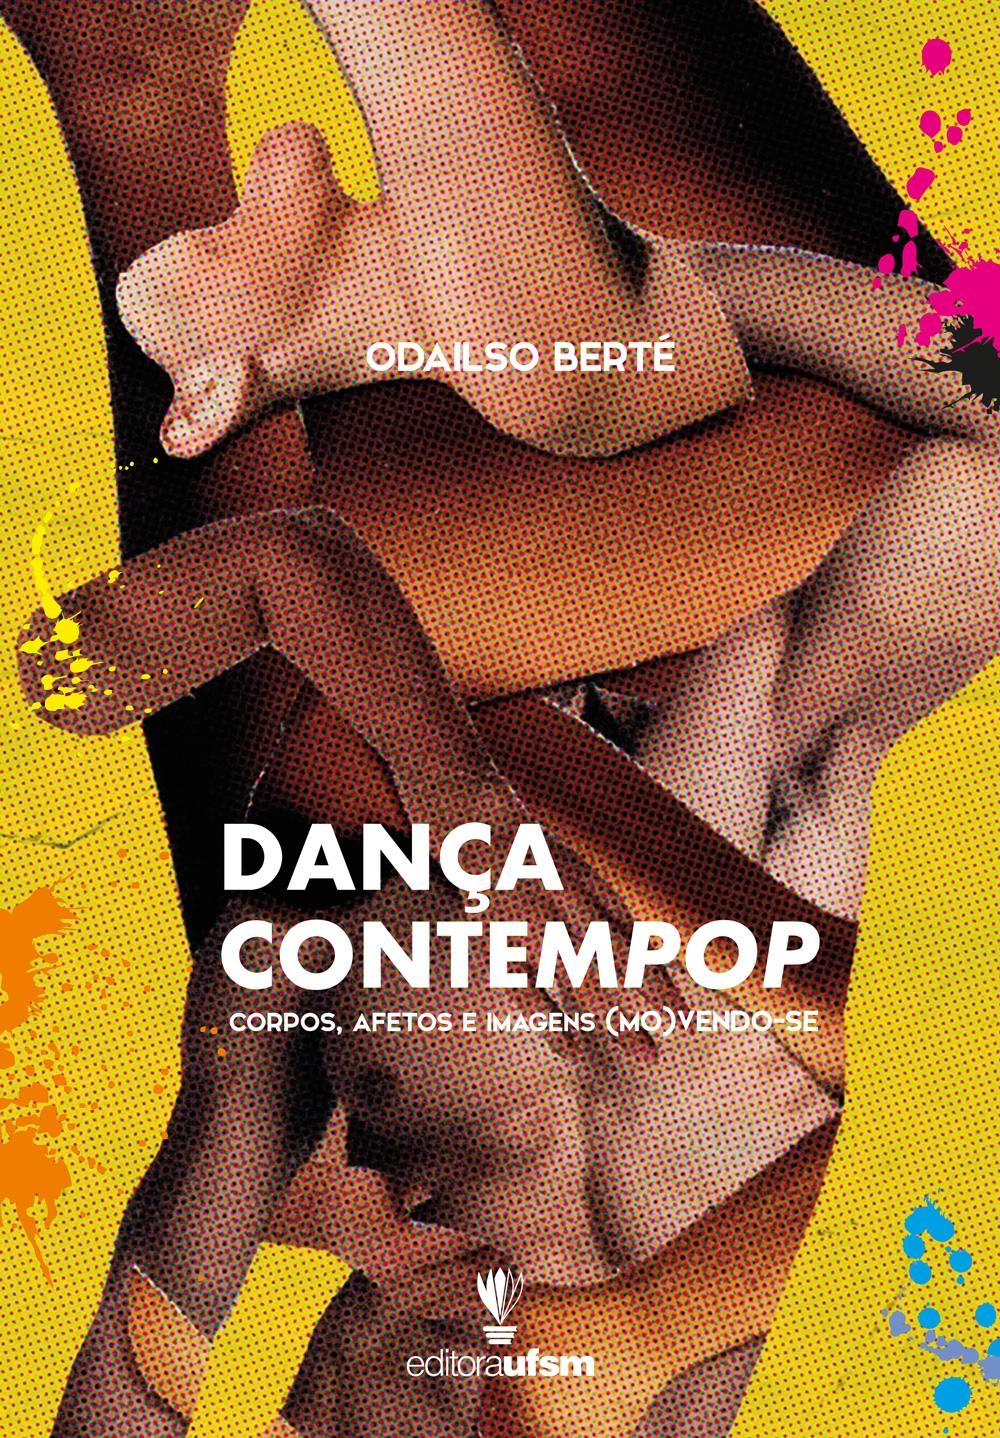 Capa_Dança_Contempop